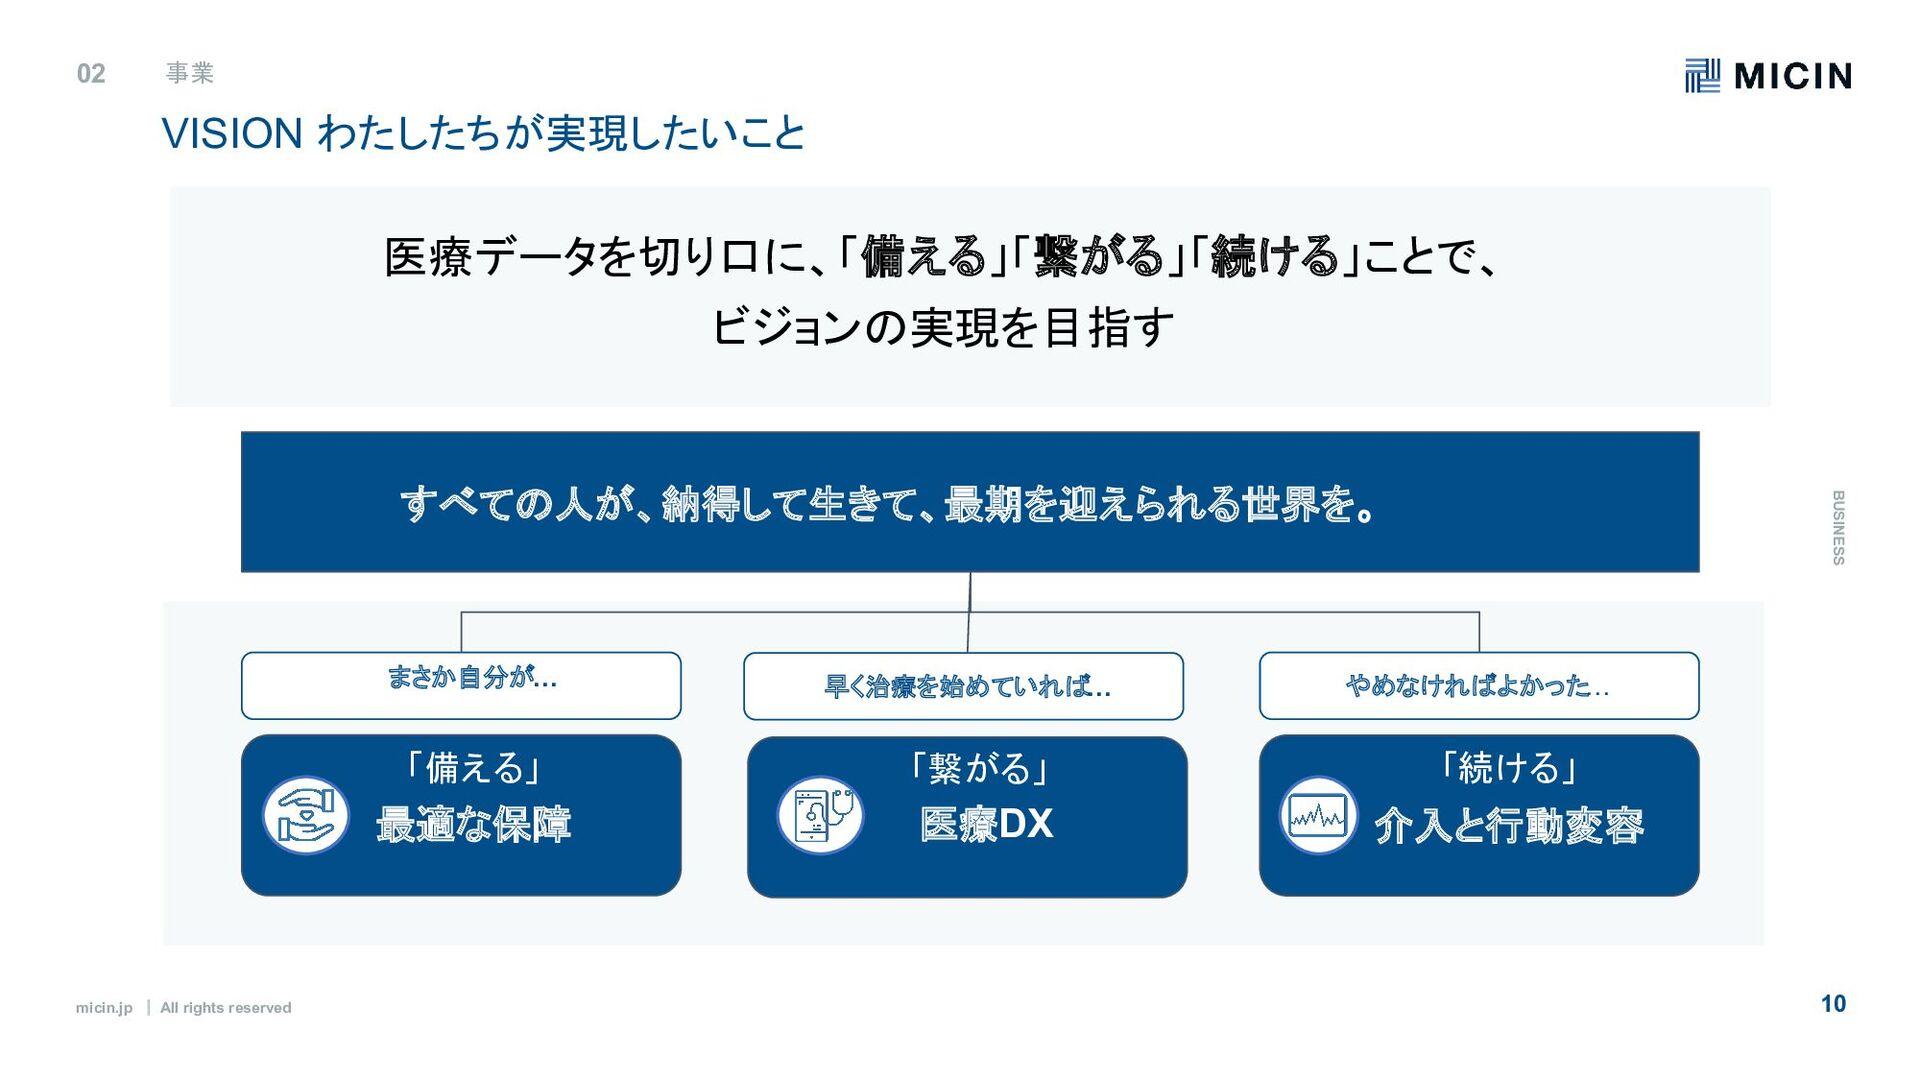 micin.jp ʛ All rights reserved 10 ۀ༰ 02 ۀ B ...